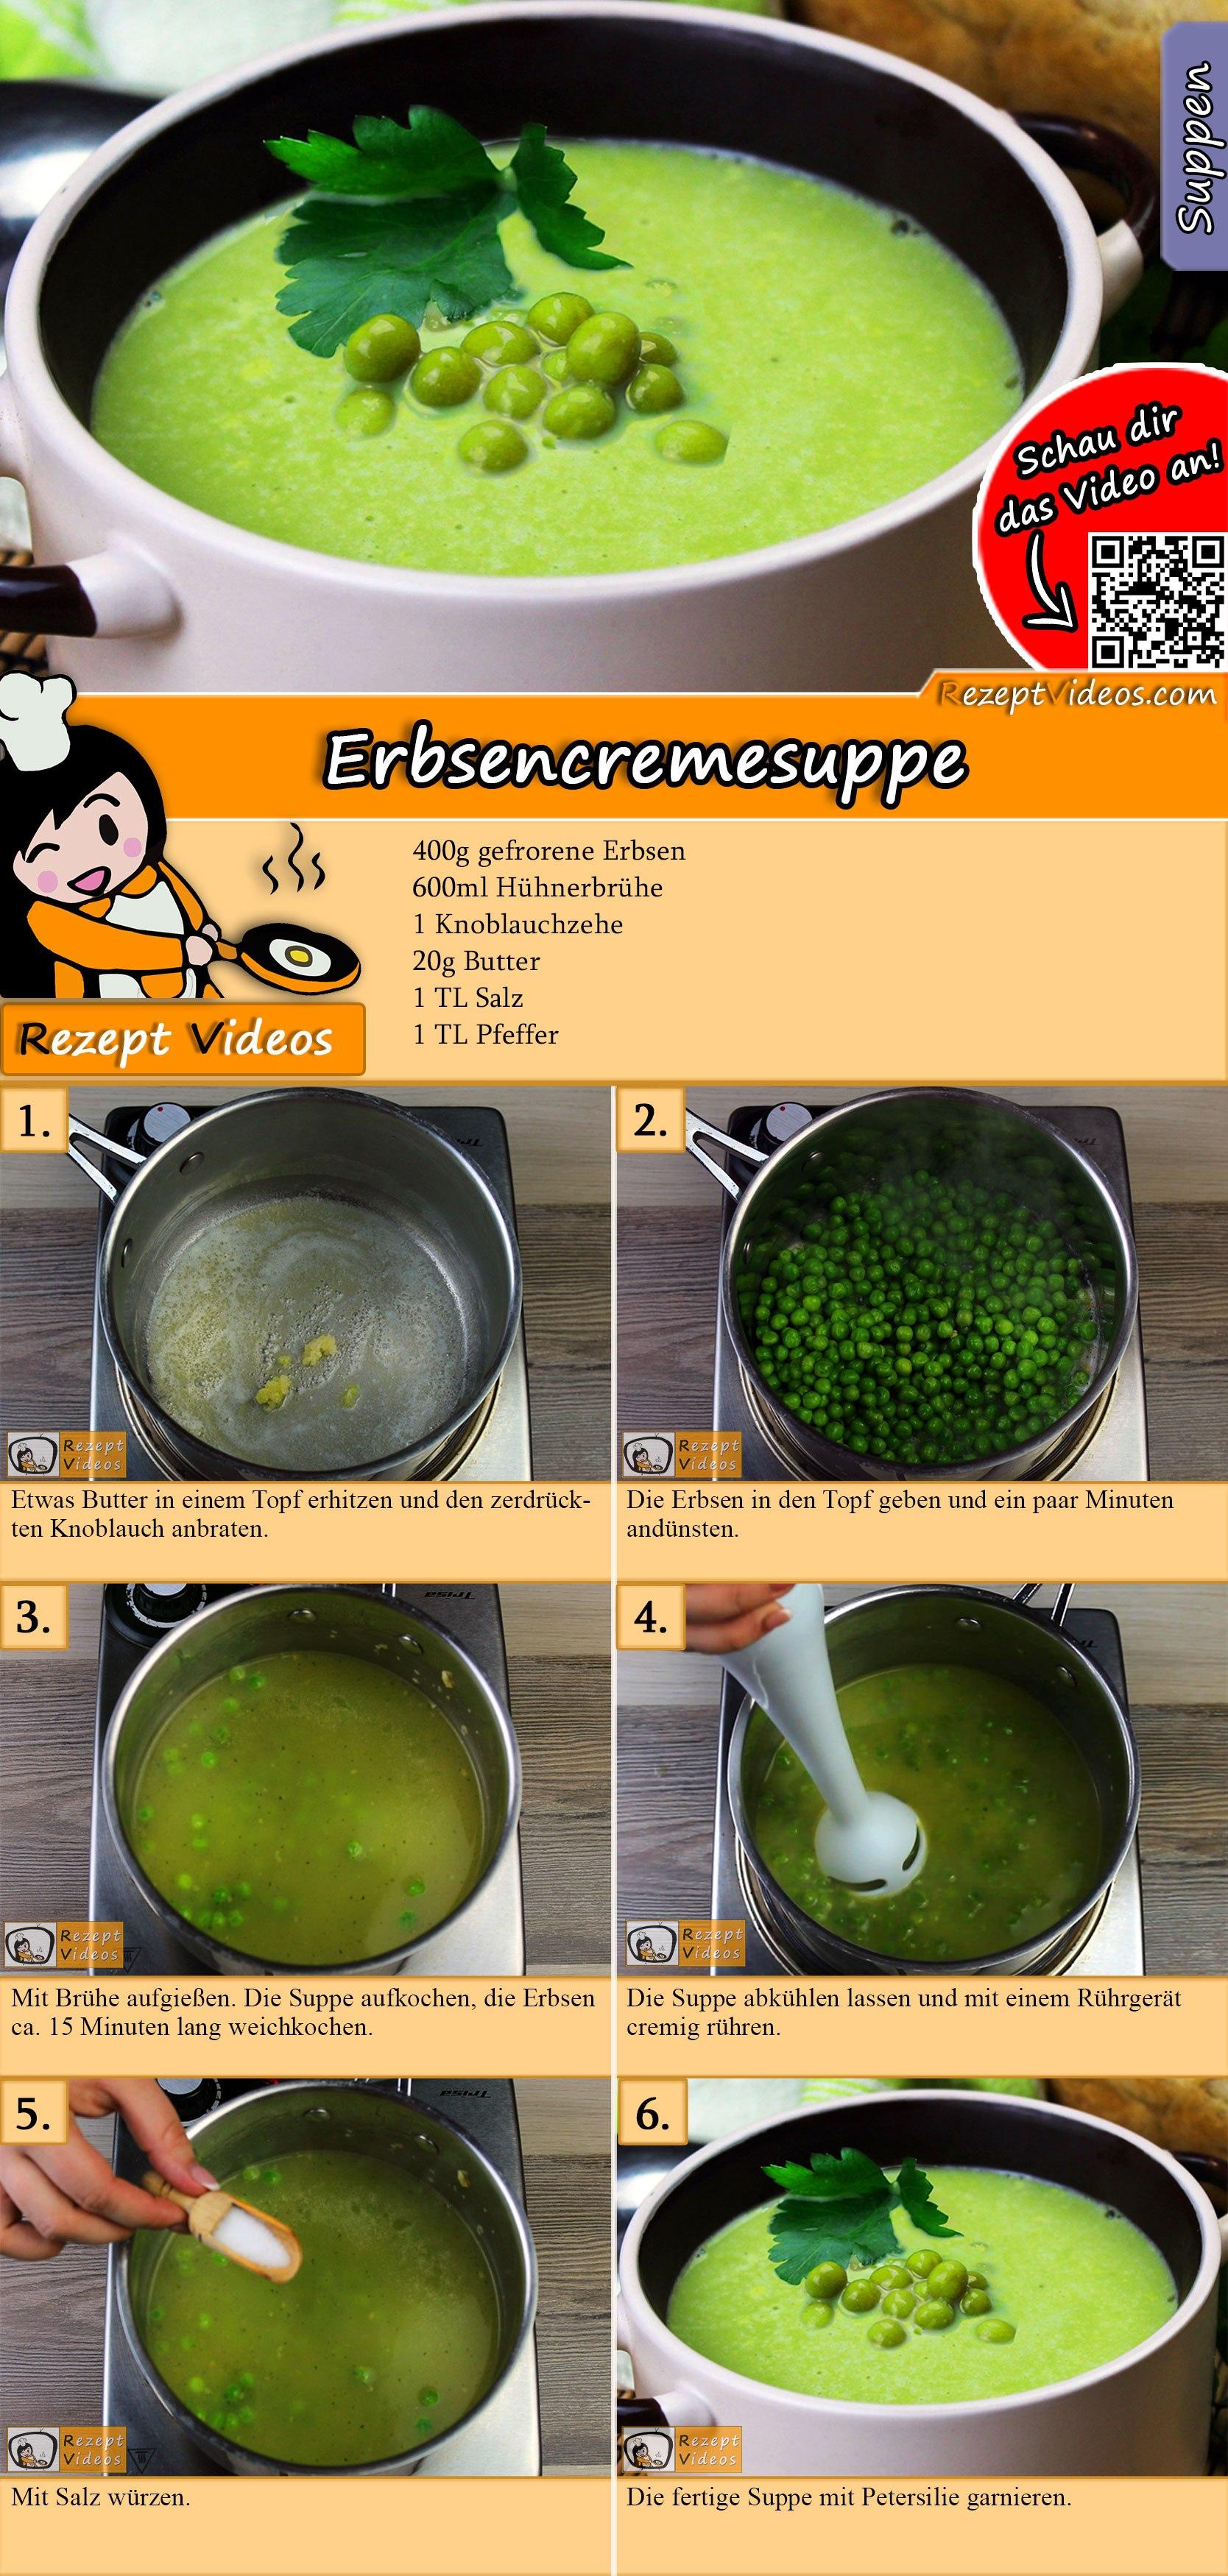 Erbsencremesuppe Rezept mit Video